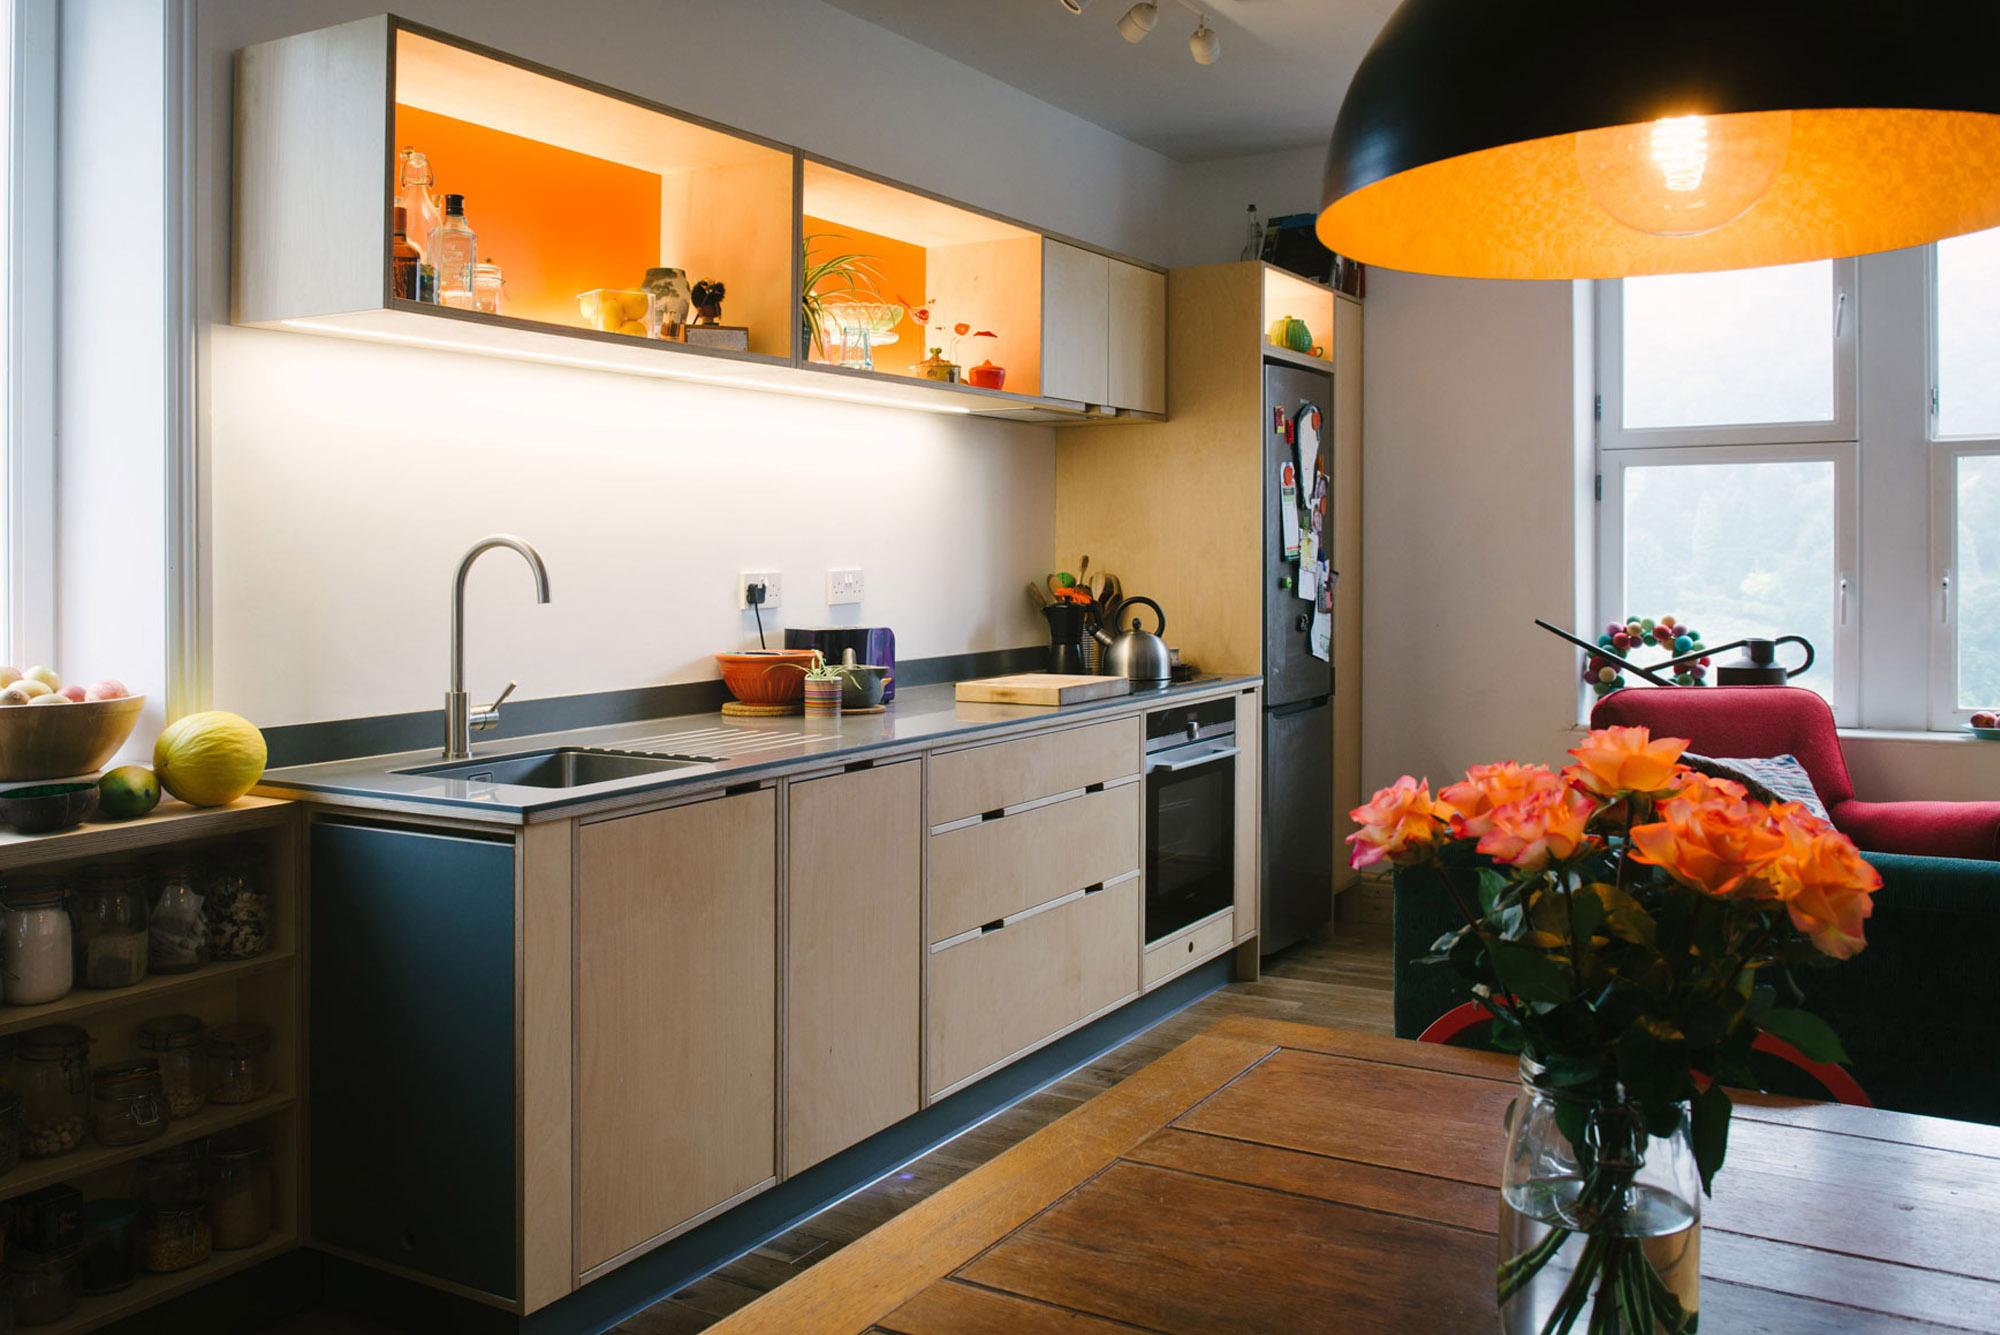 Birch ply kitchens UK manufactured